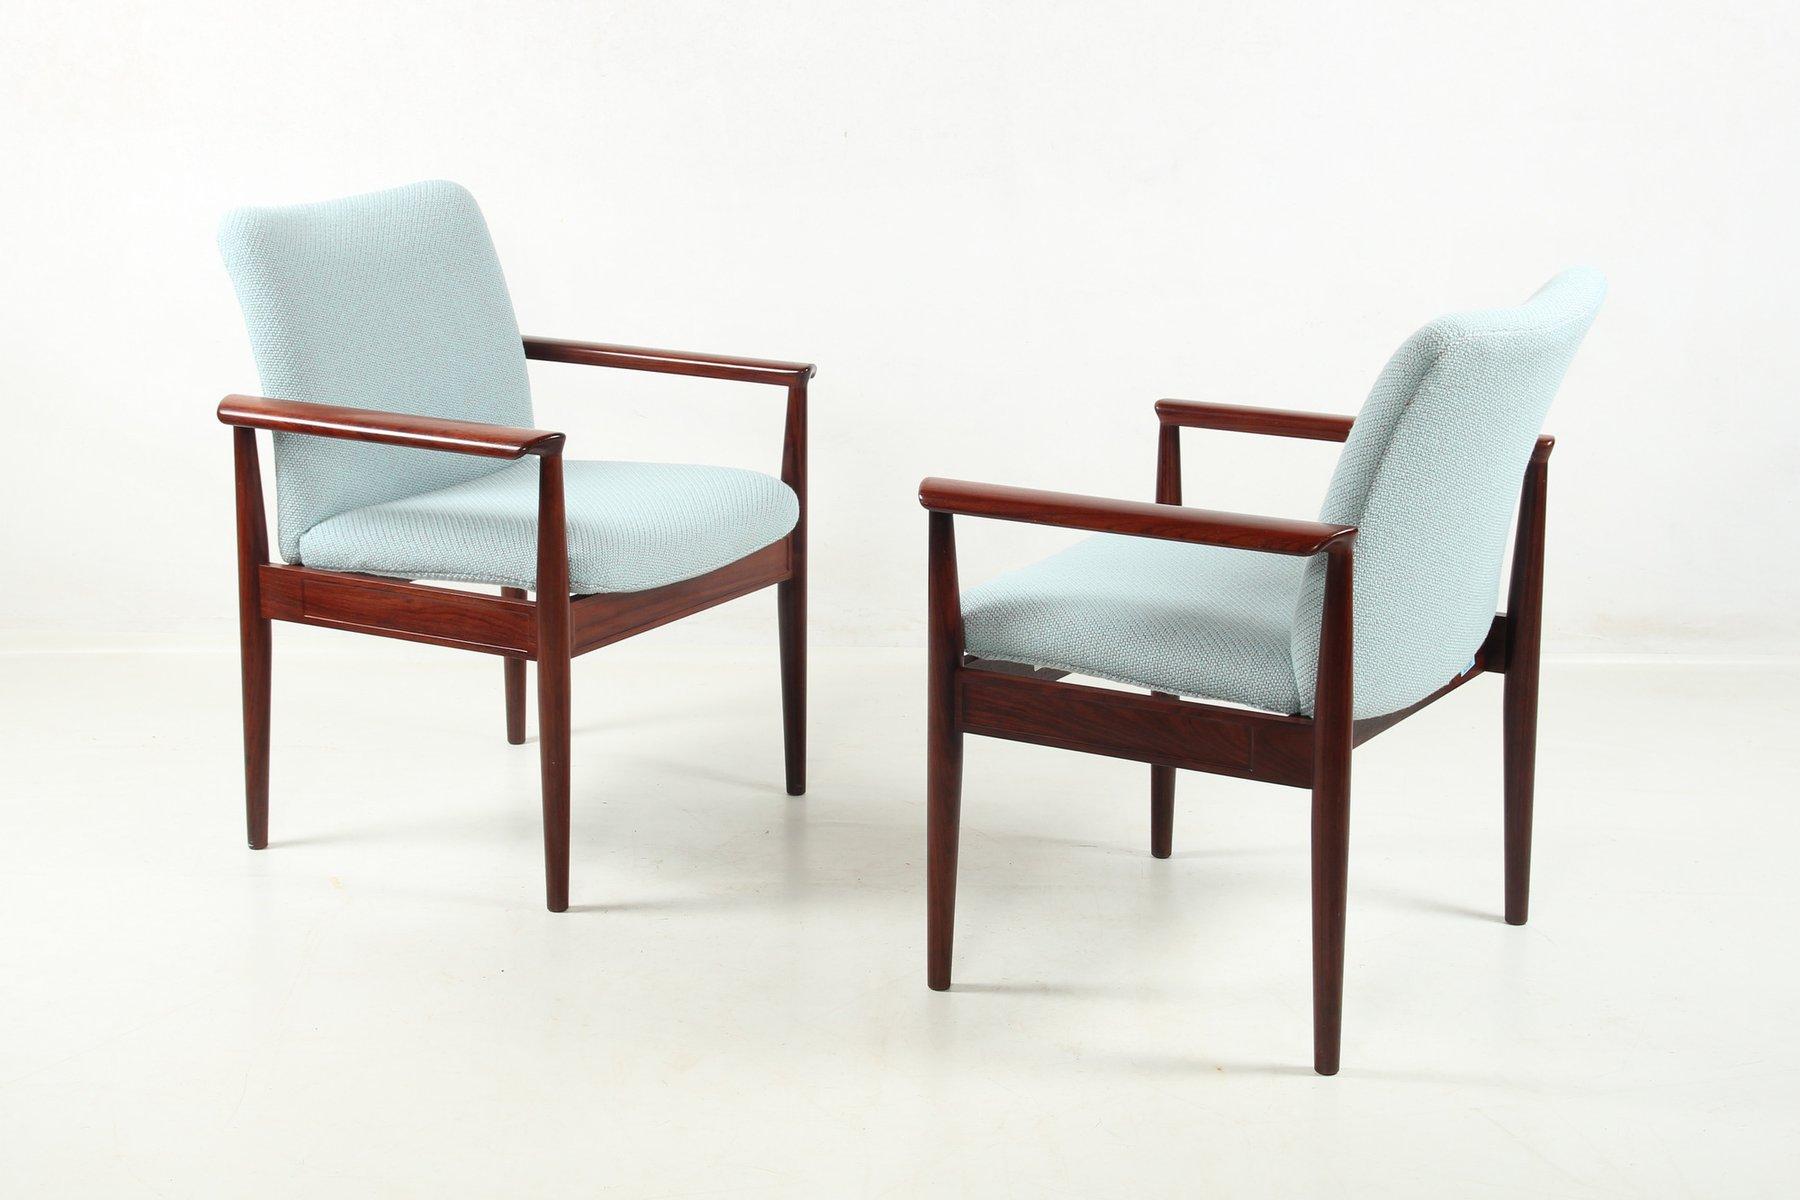 Diplomat Chair In Tulipwood By Finn Juhl For Cado, 1960s